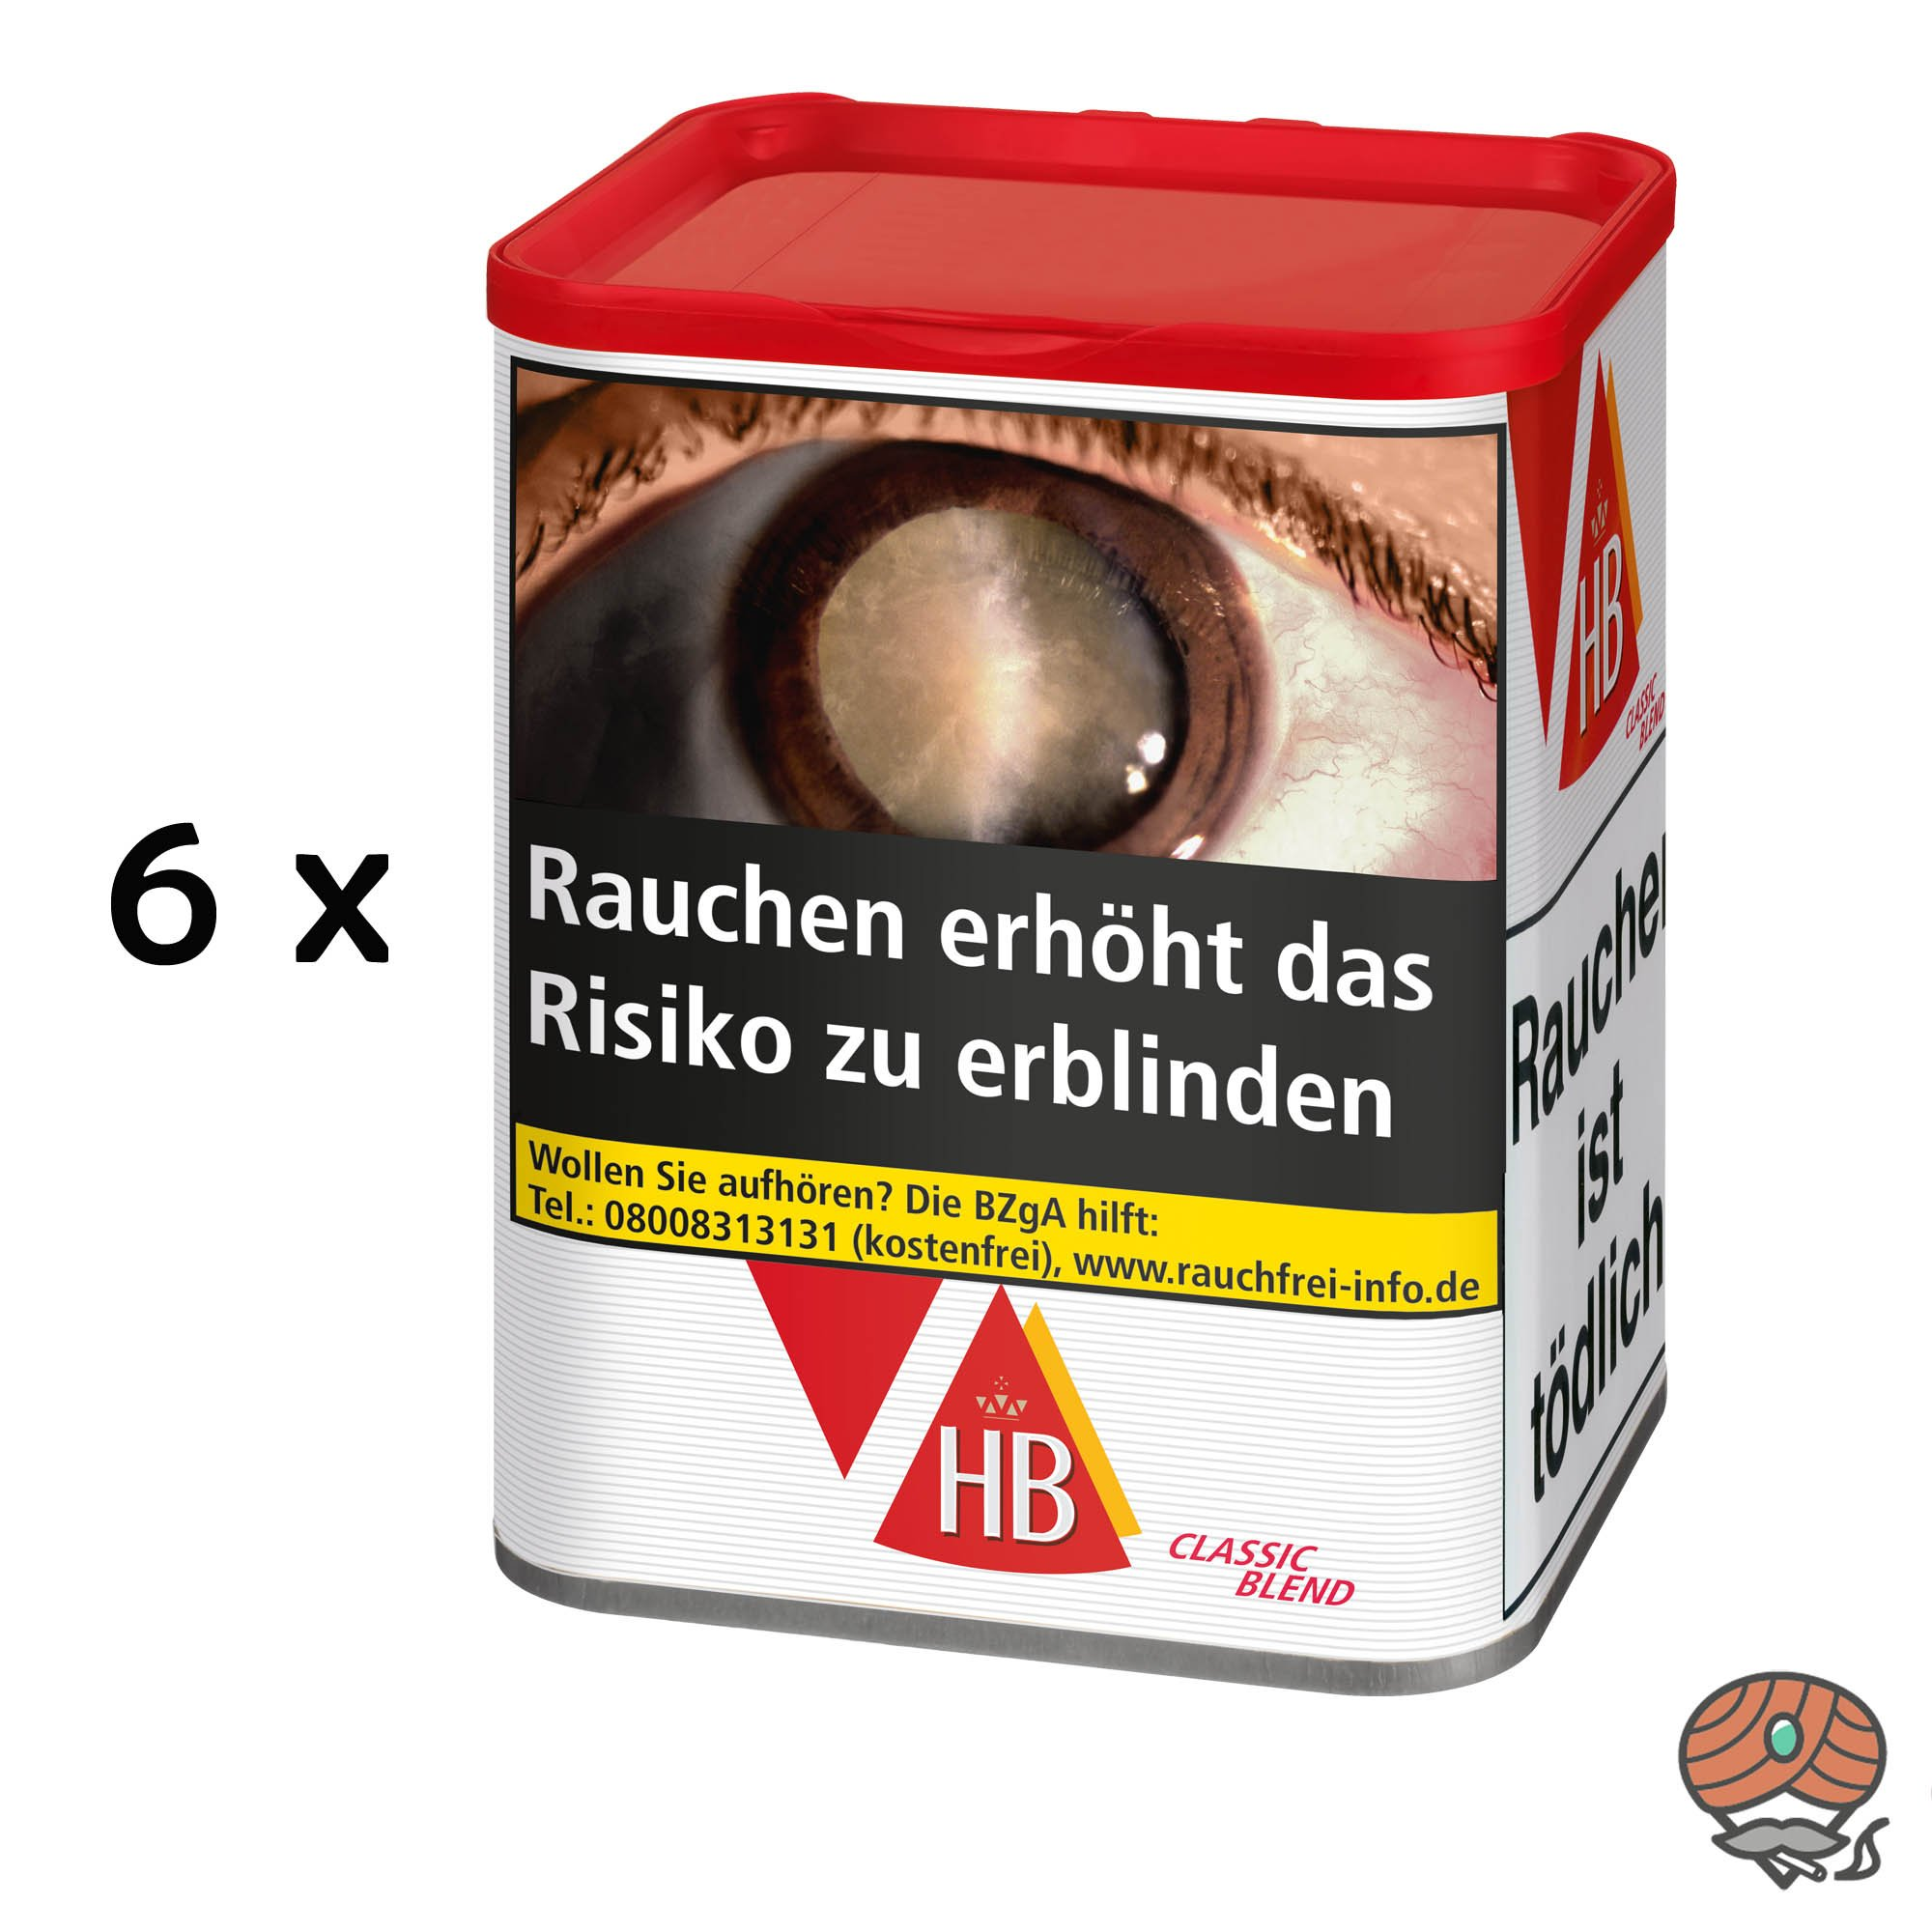 6 x HB Quality Blend / Classic Blend Zigarettentabak 90 g Dose